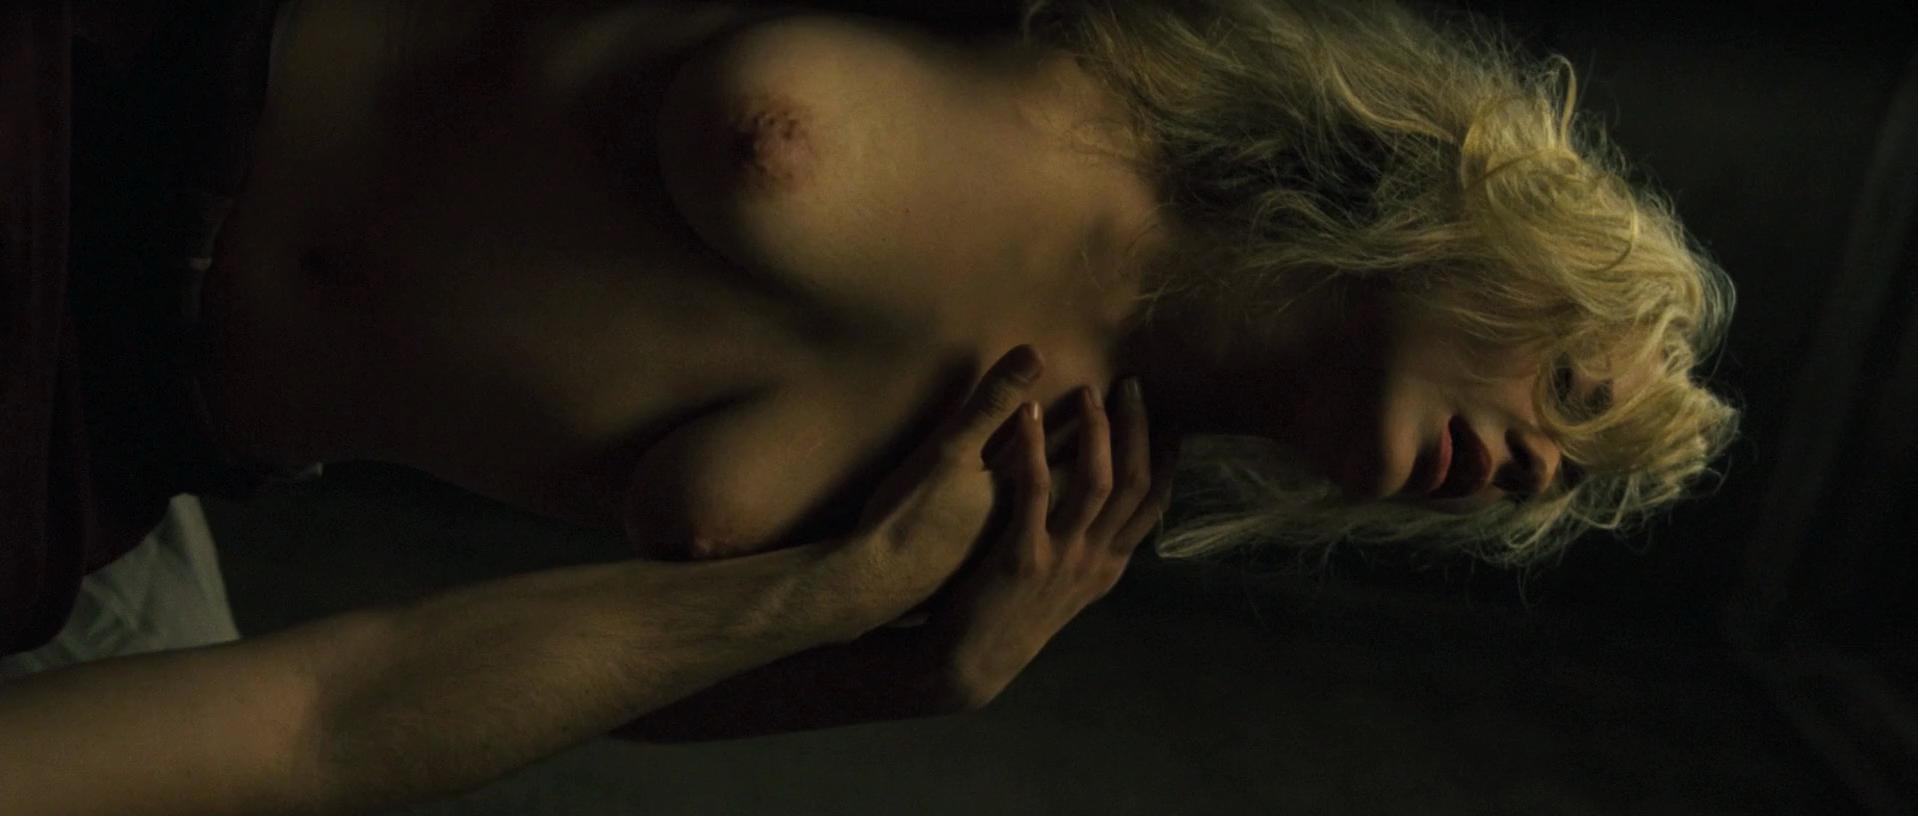 Немецкую жену эротическое видео марион котийяр онлайн фото